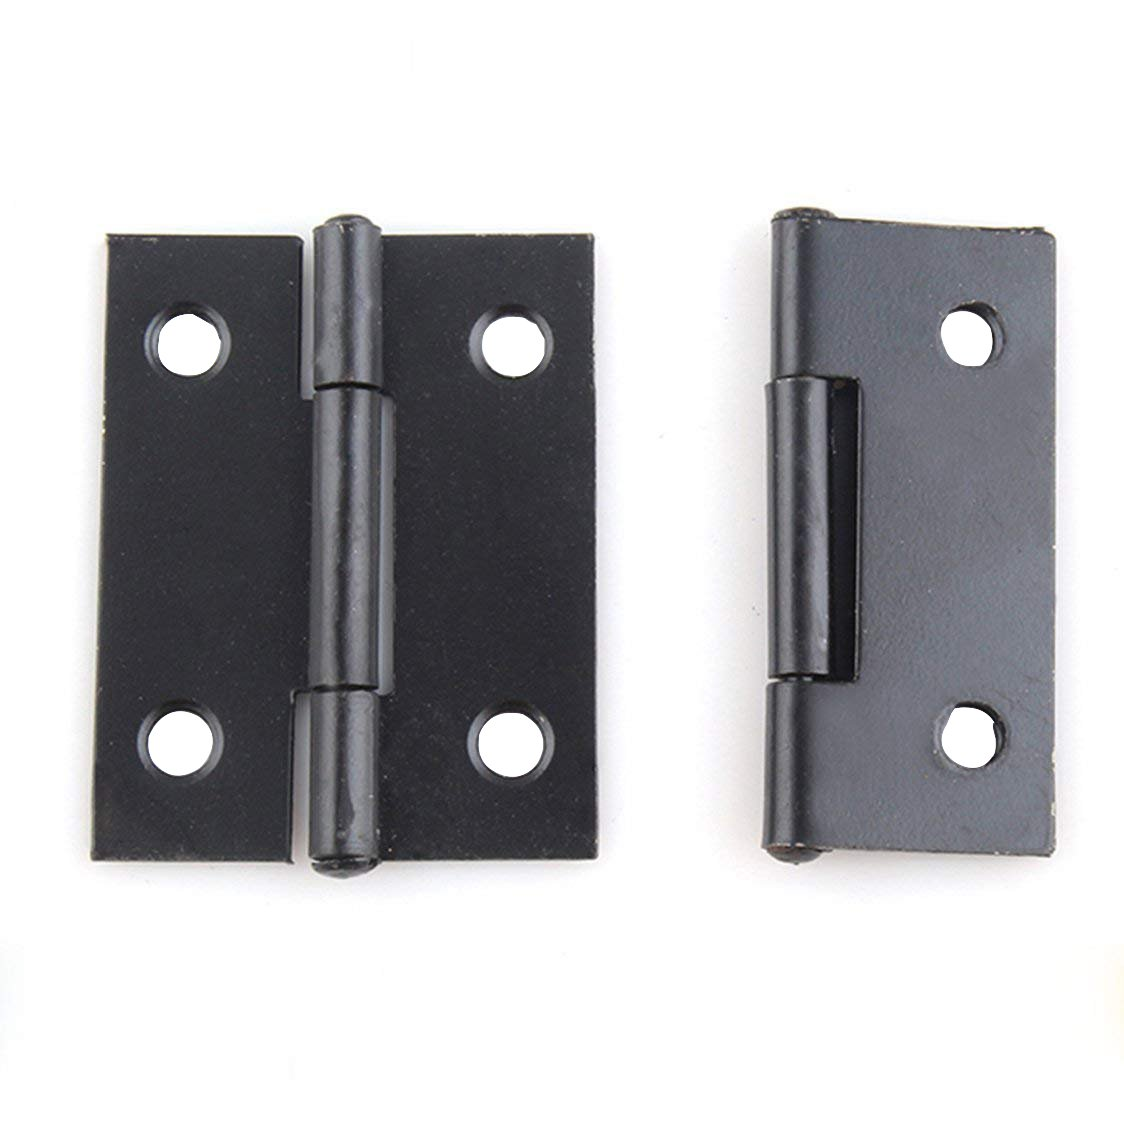 RZDEAL Light Medium Duty Door Hinges with Radius Corners 1.5 x1.2 x 0.31 in 38 x 30 x 0.8mm Matte Black 20PCS